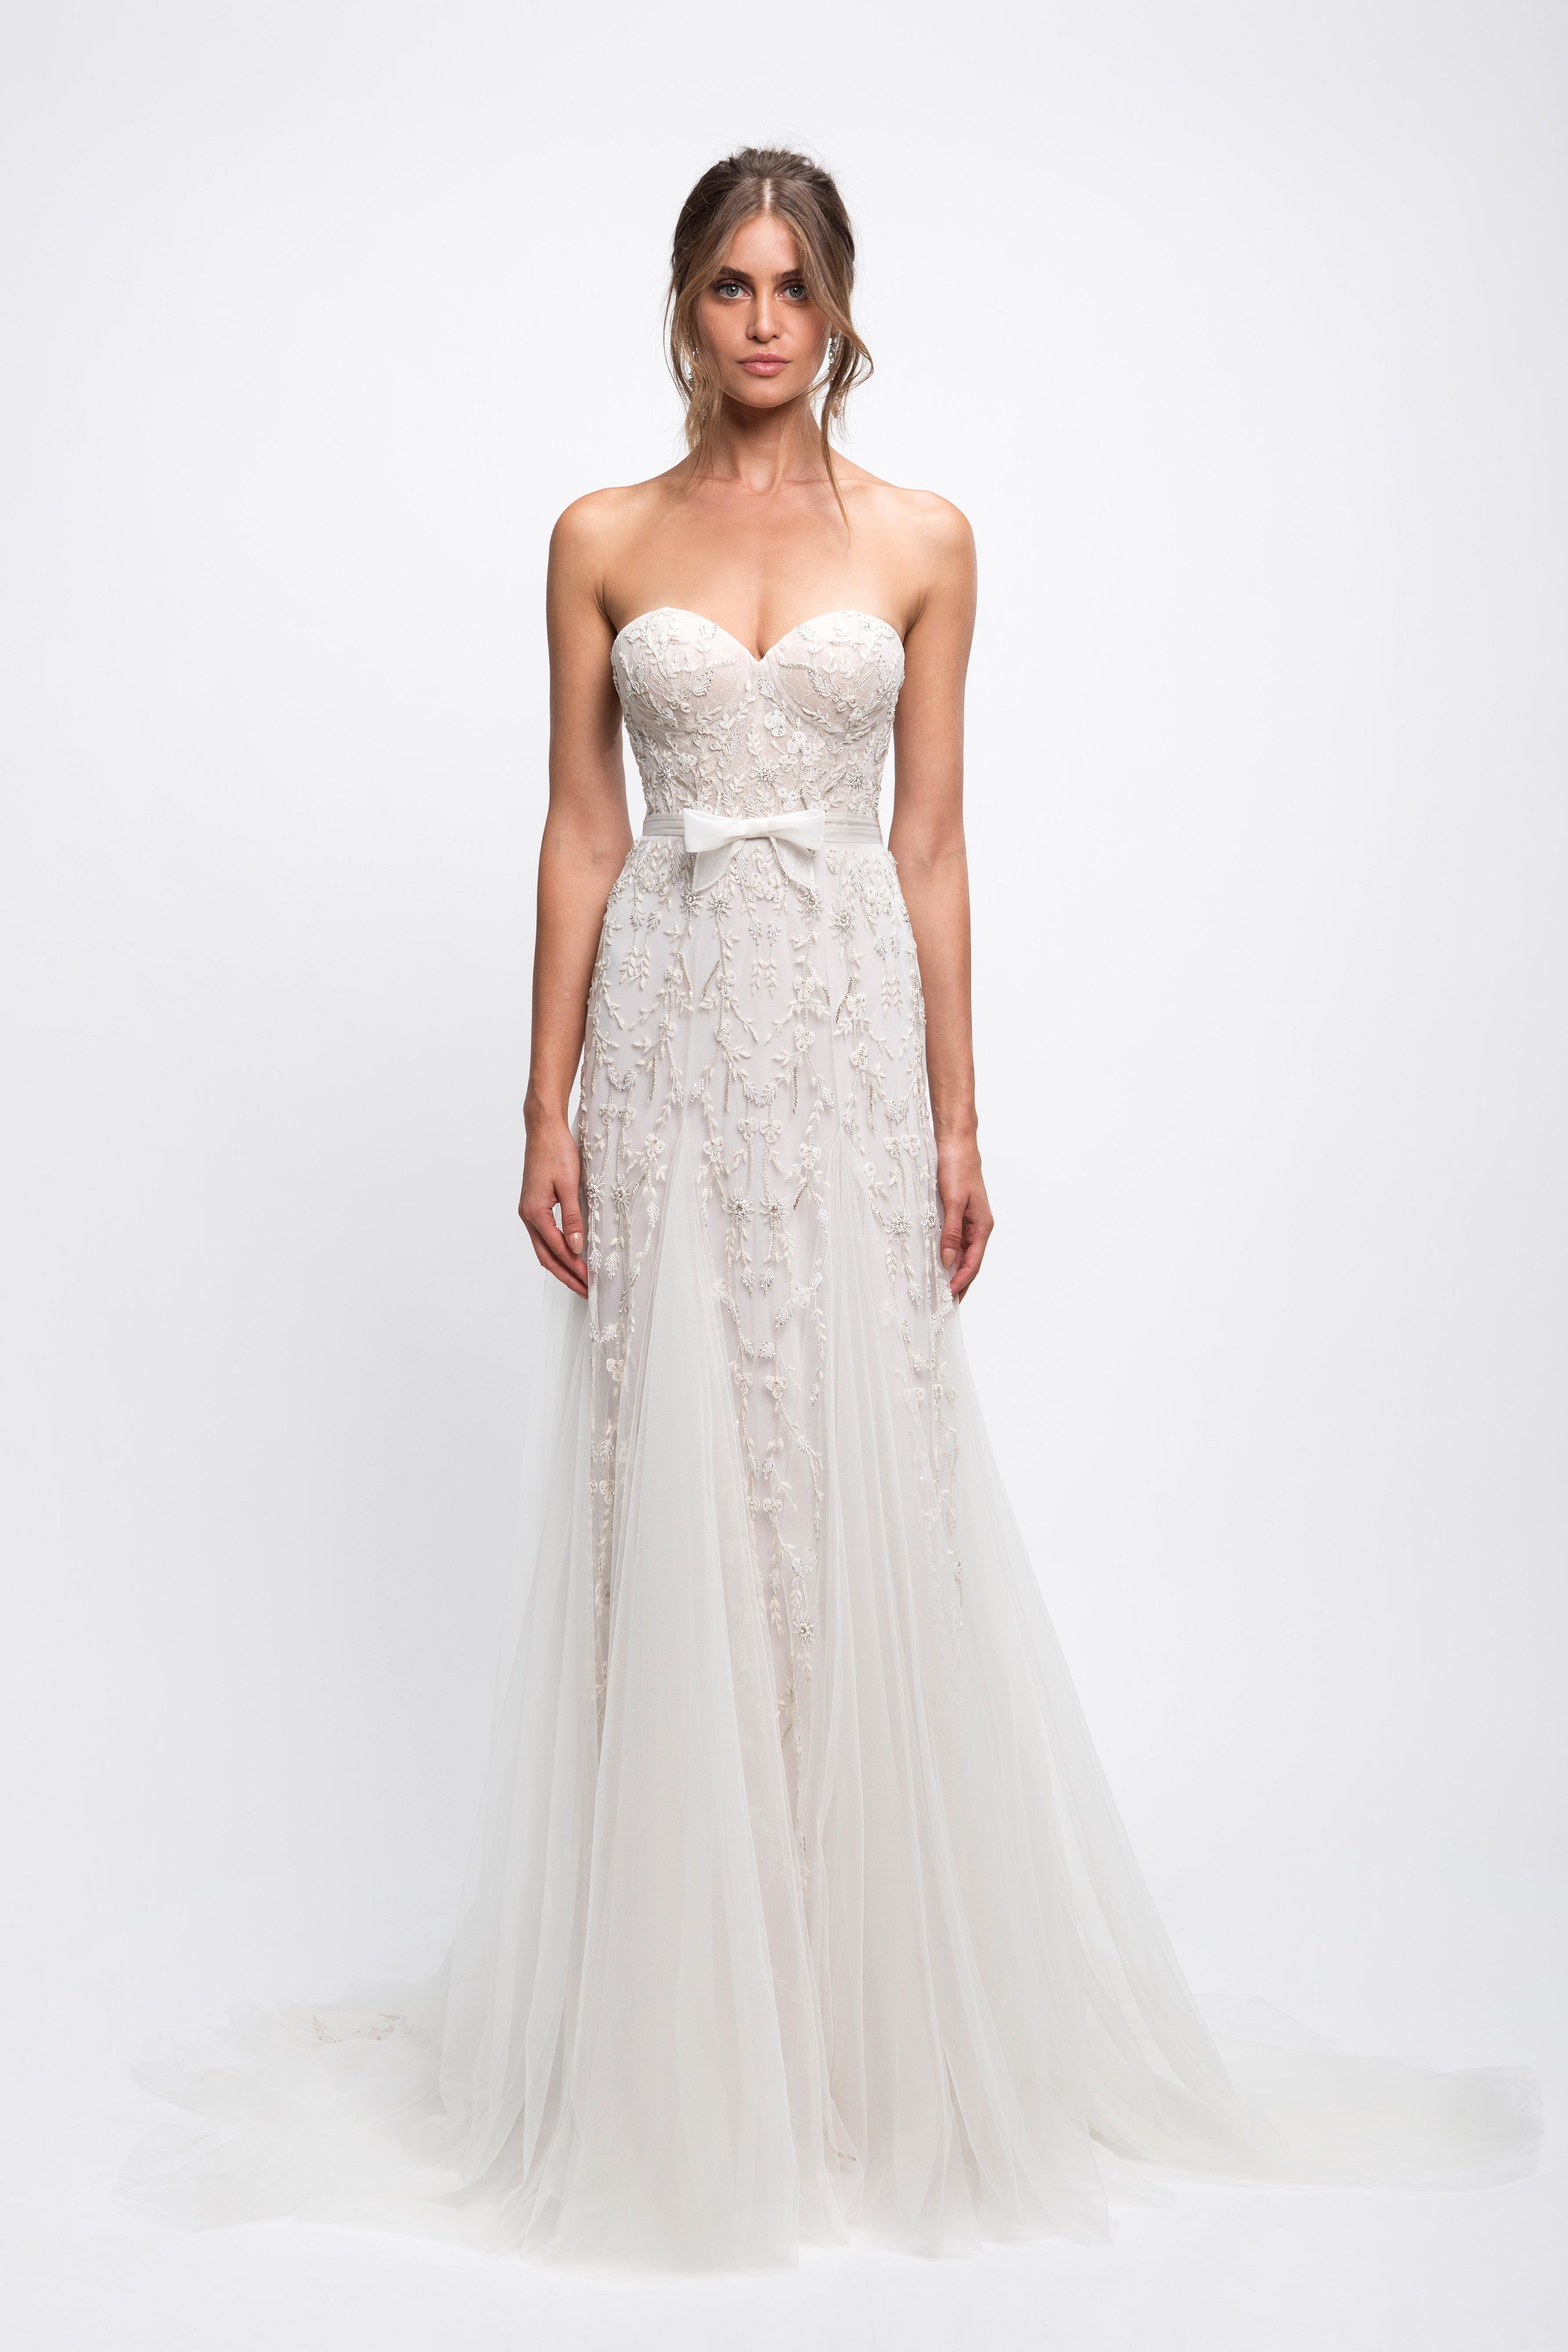 lihi hod wedding dress sweetheart strapless floral applique trumpet